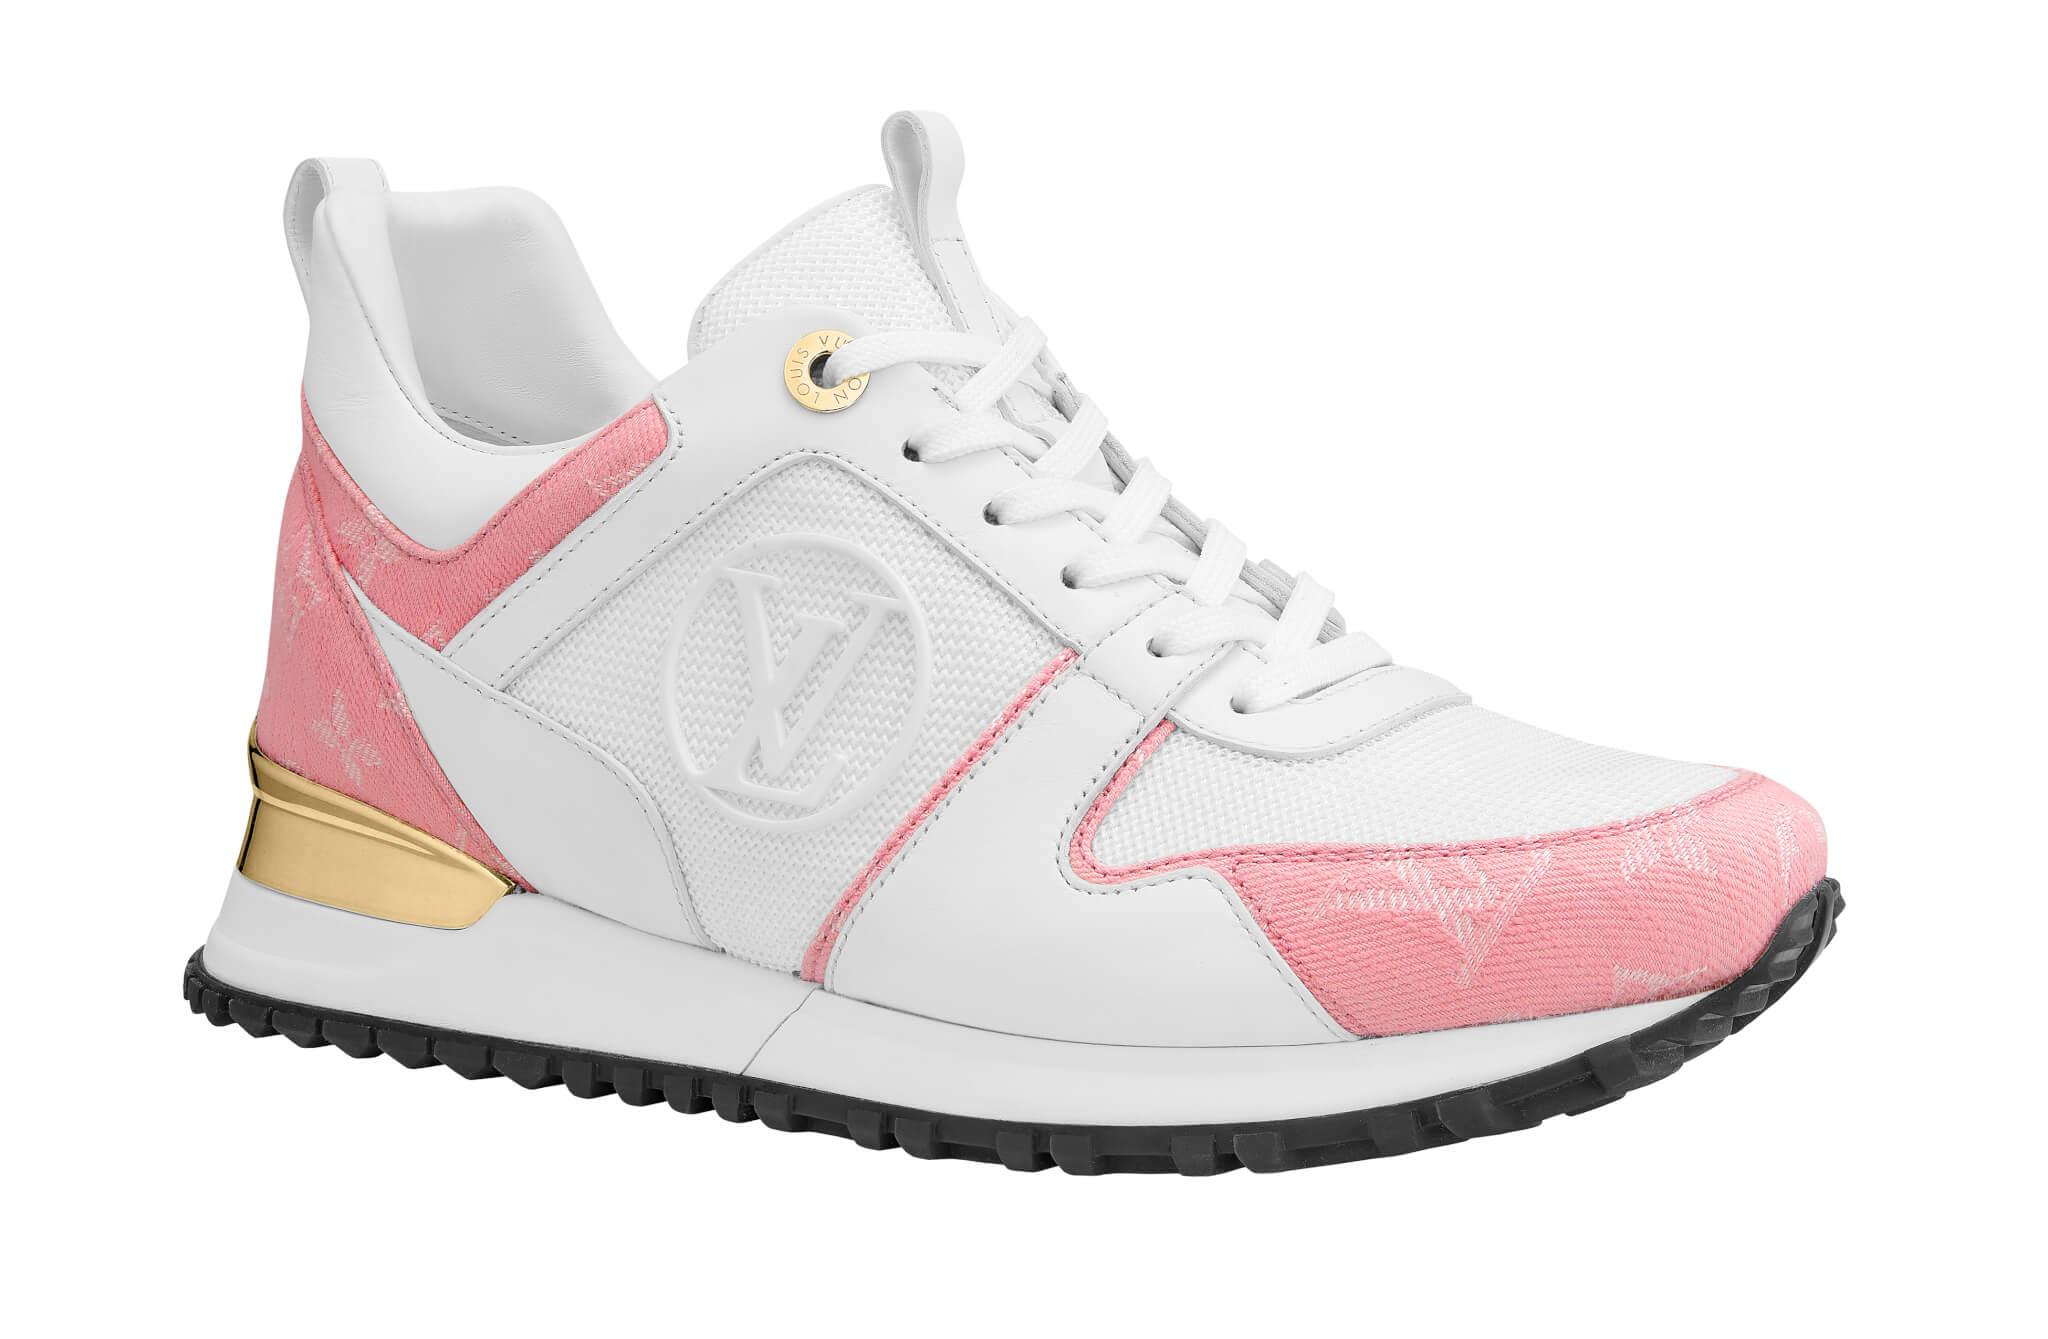 RUN AWAY 運動鞋HK$7,100